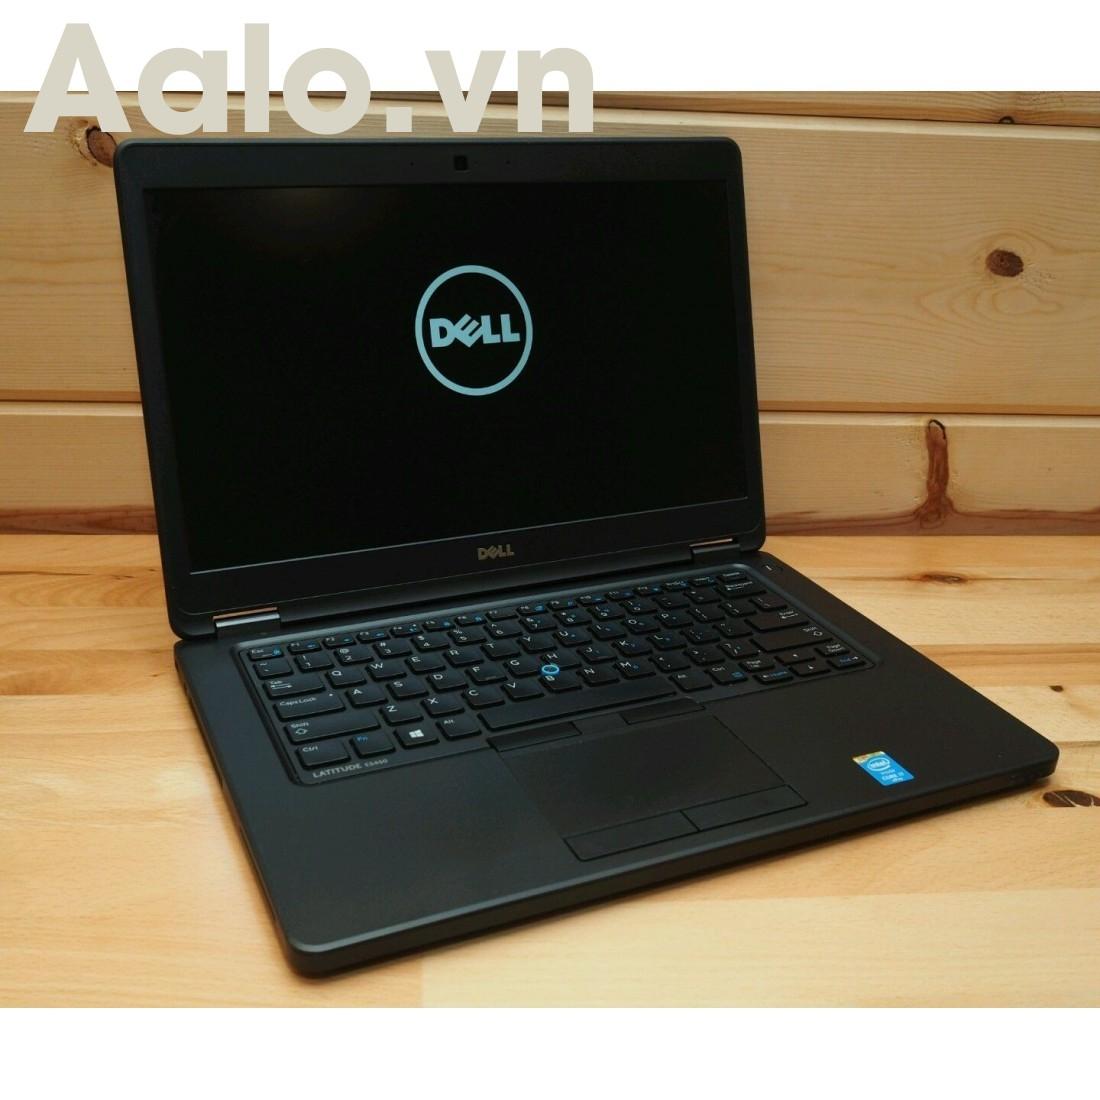 Laptop cũ Dell Latitude E5450 (i5 5300U/ 4GB/ HDD 320GB/ 14 inch HD)